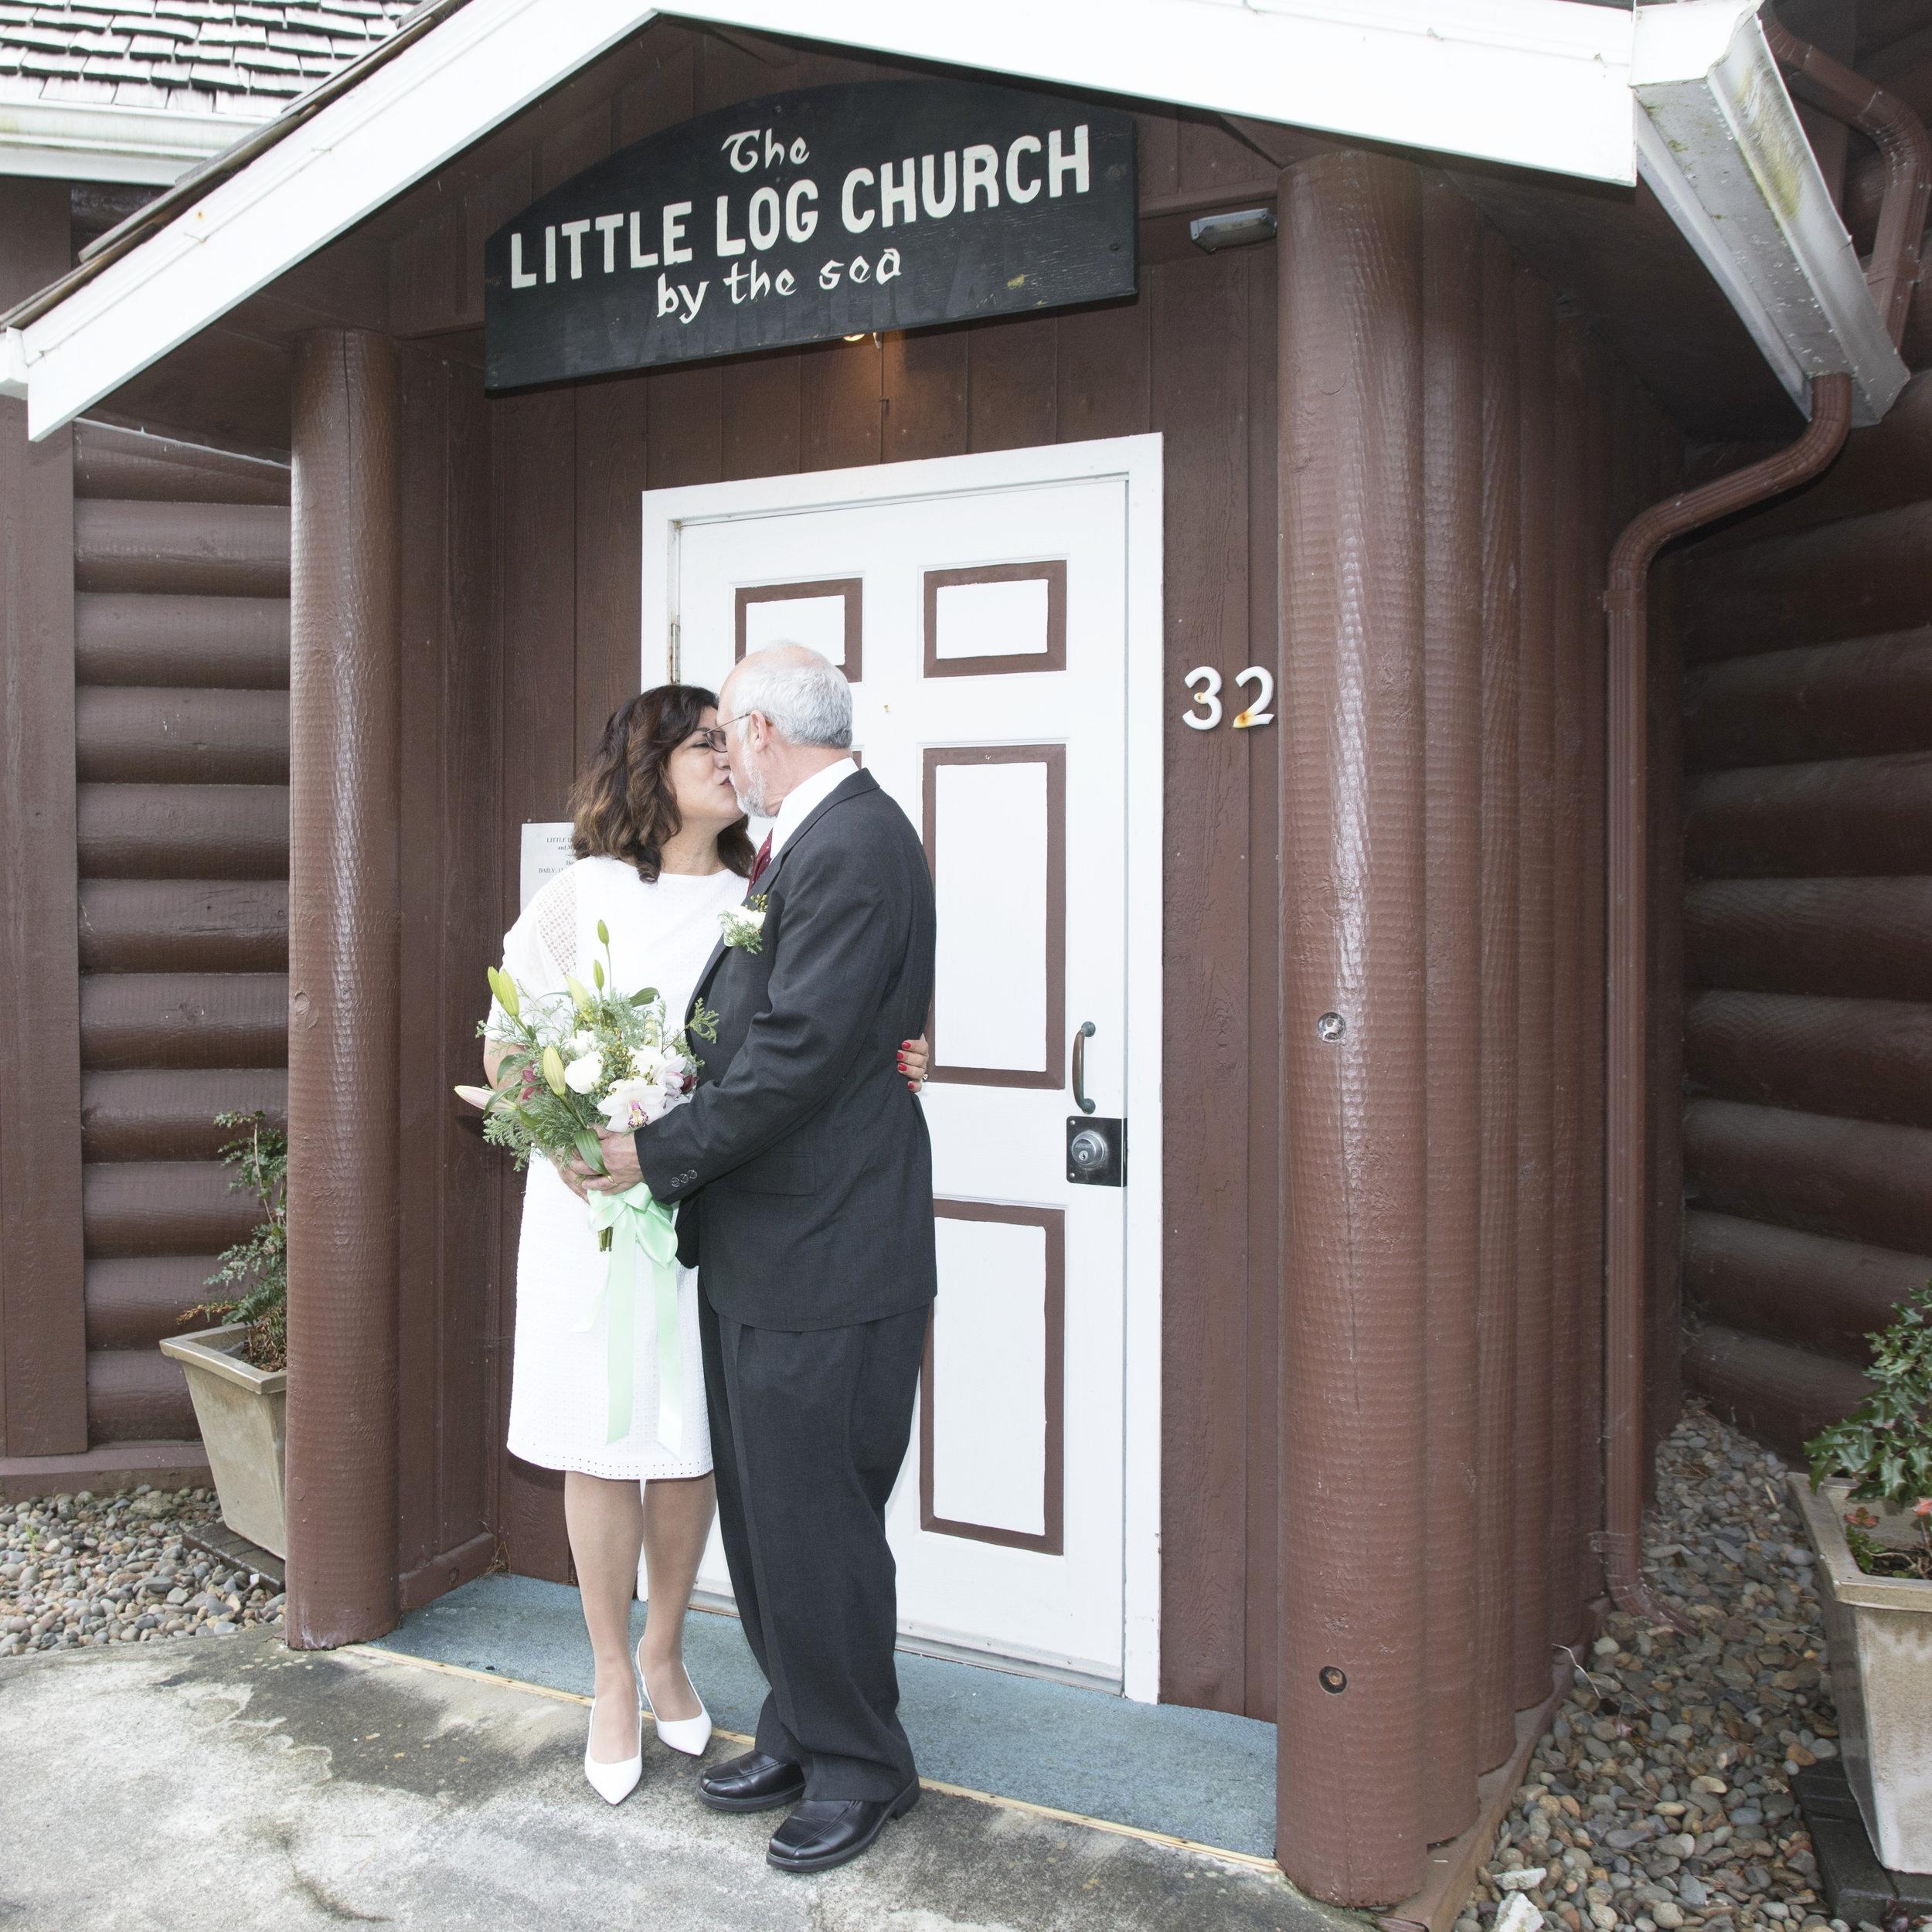 20141222_134031_Mark and Lucy Wilk wedding.jpg